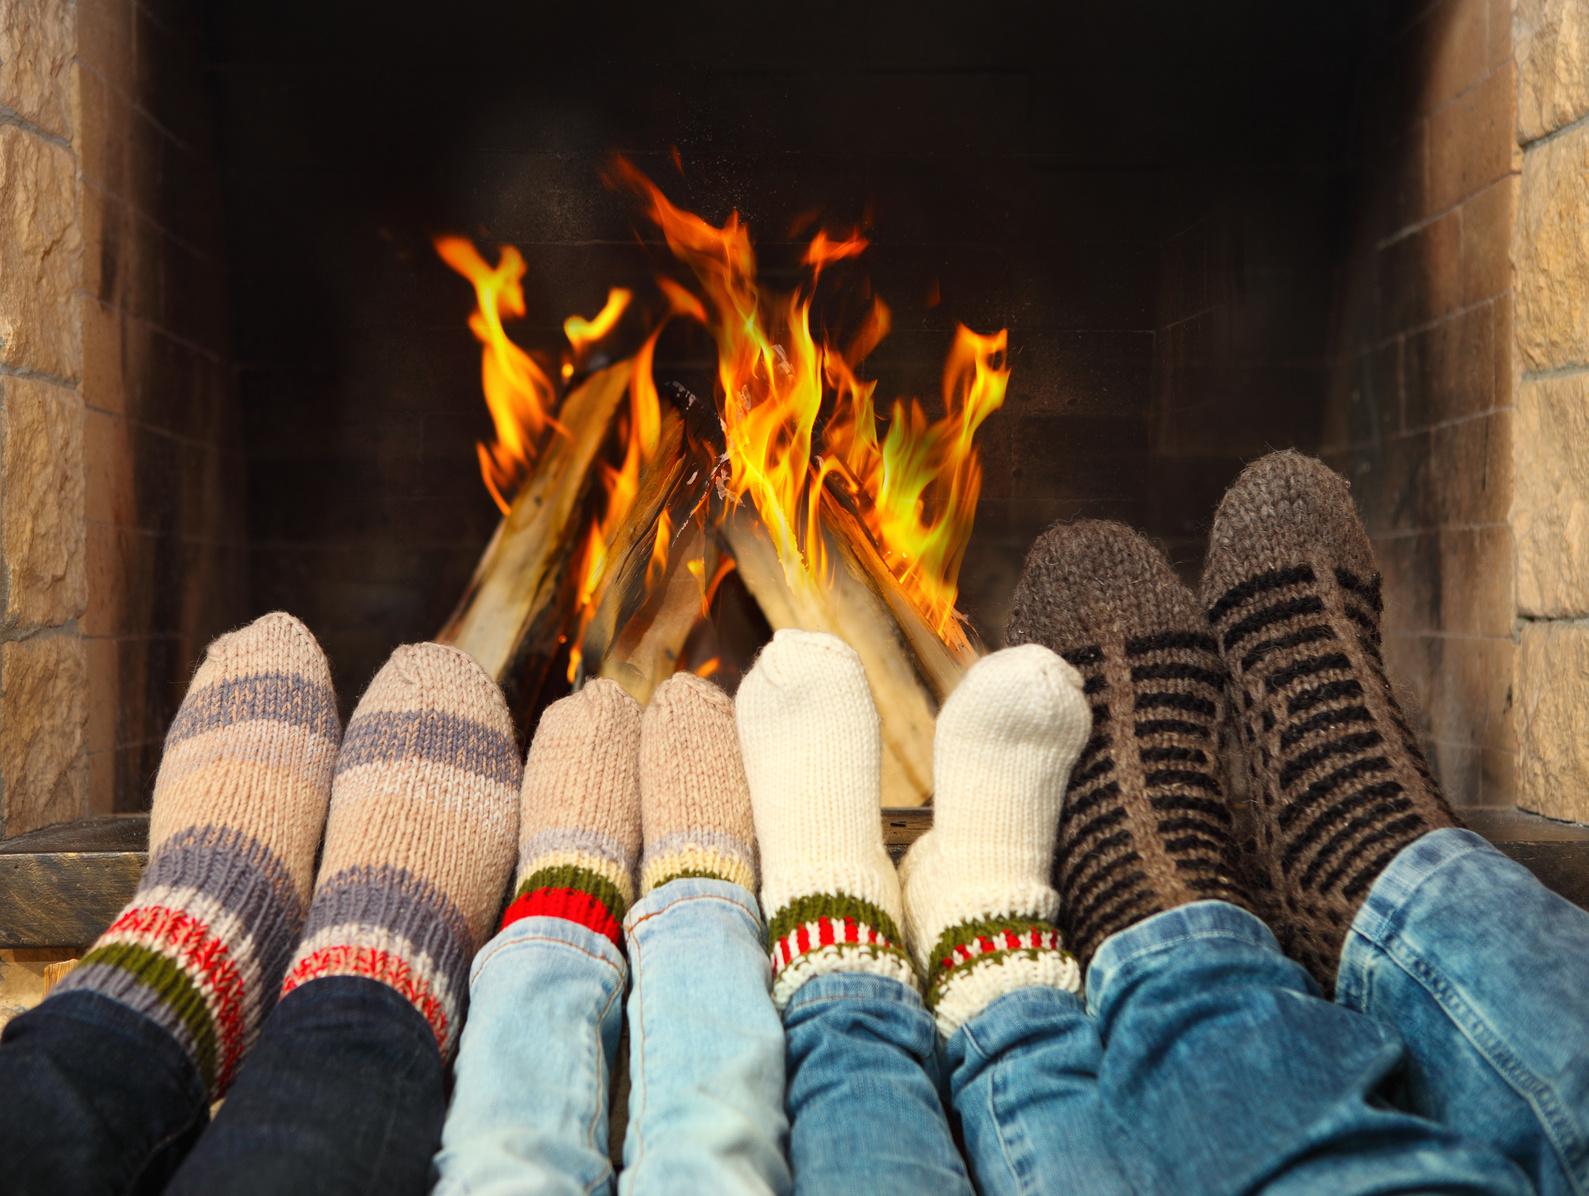 Feets of a family wearing woolen socks warming near the fireplace